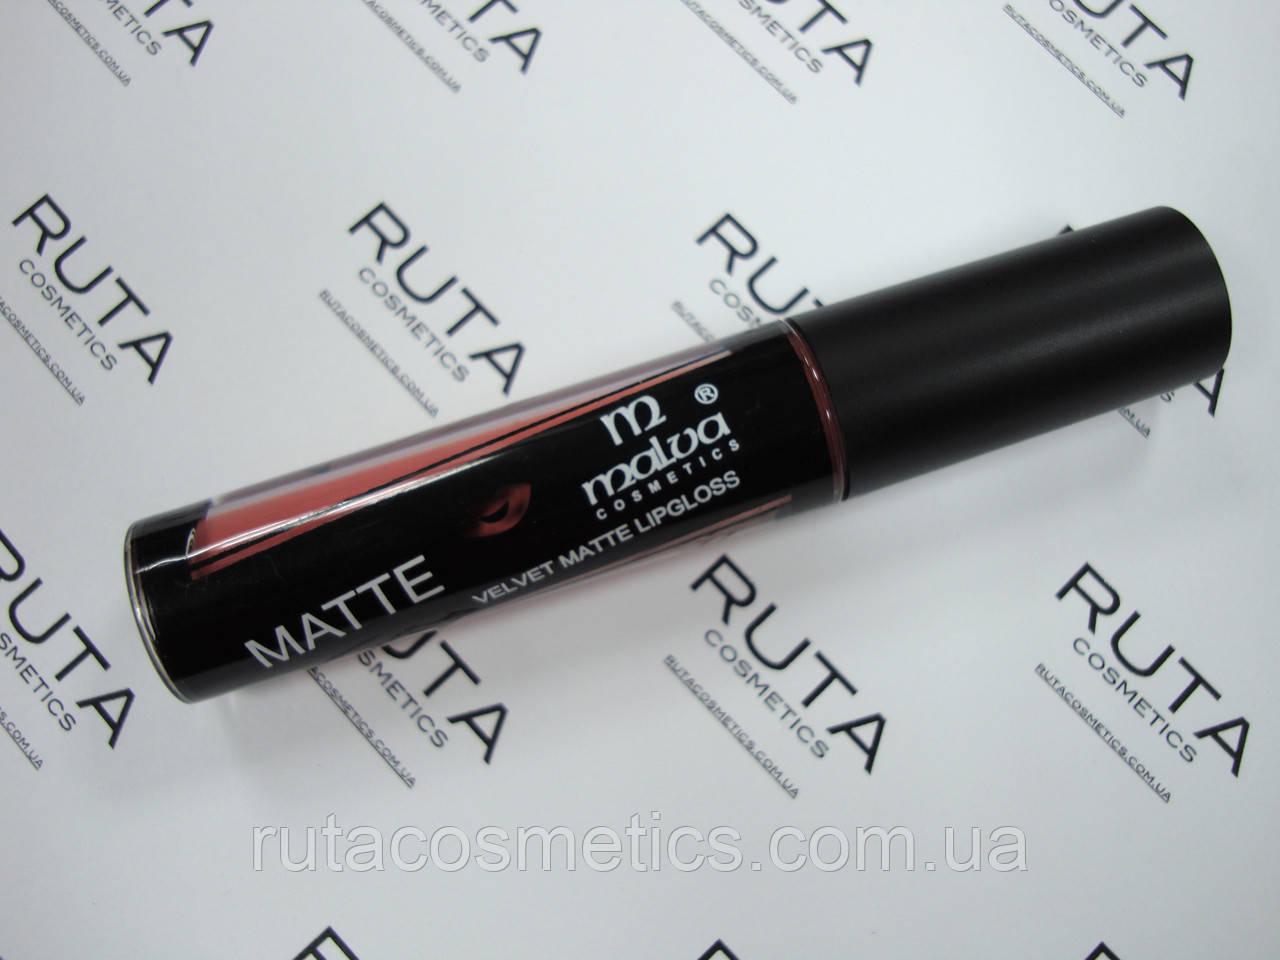 Malva cosmetics Velvet matte lipgloss жидкая матовая помада 6